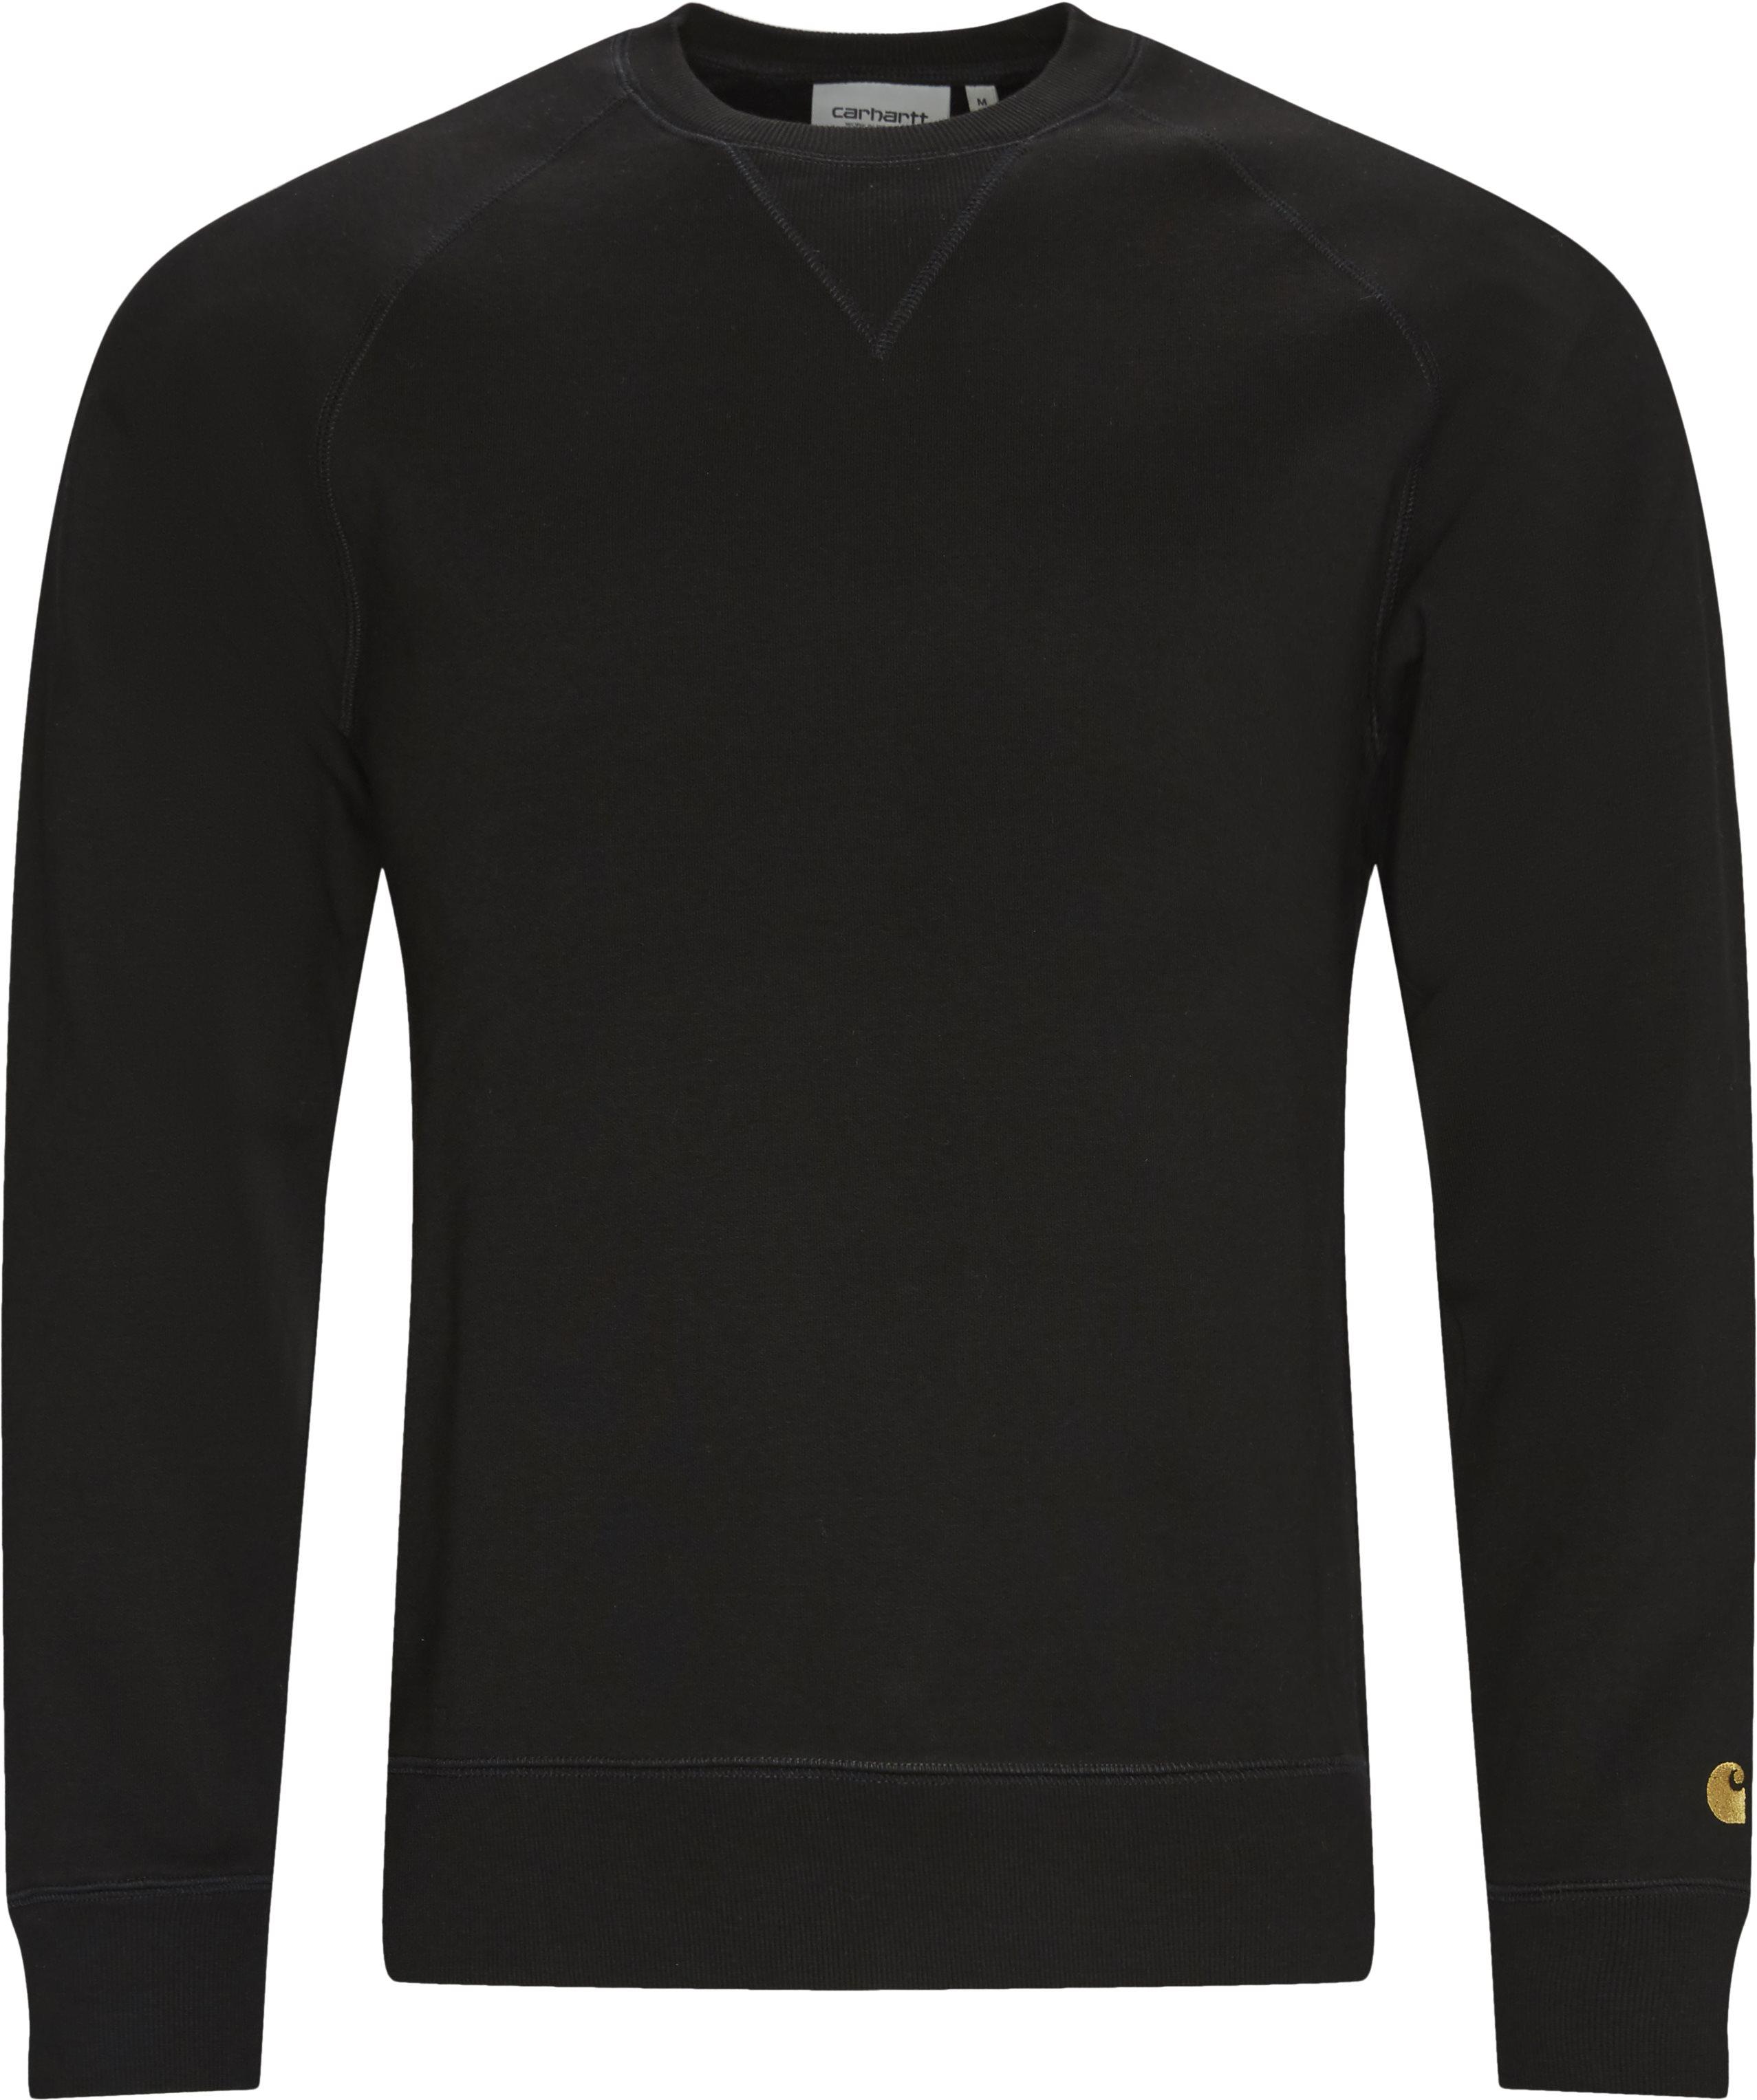 Crew Chase Sweatshirt - Sweatshirts - Regular fit - Sort